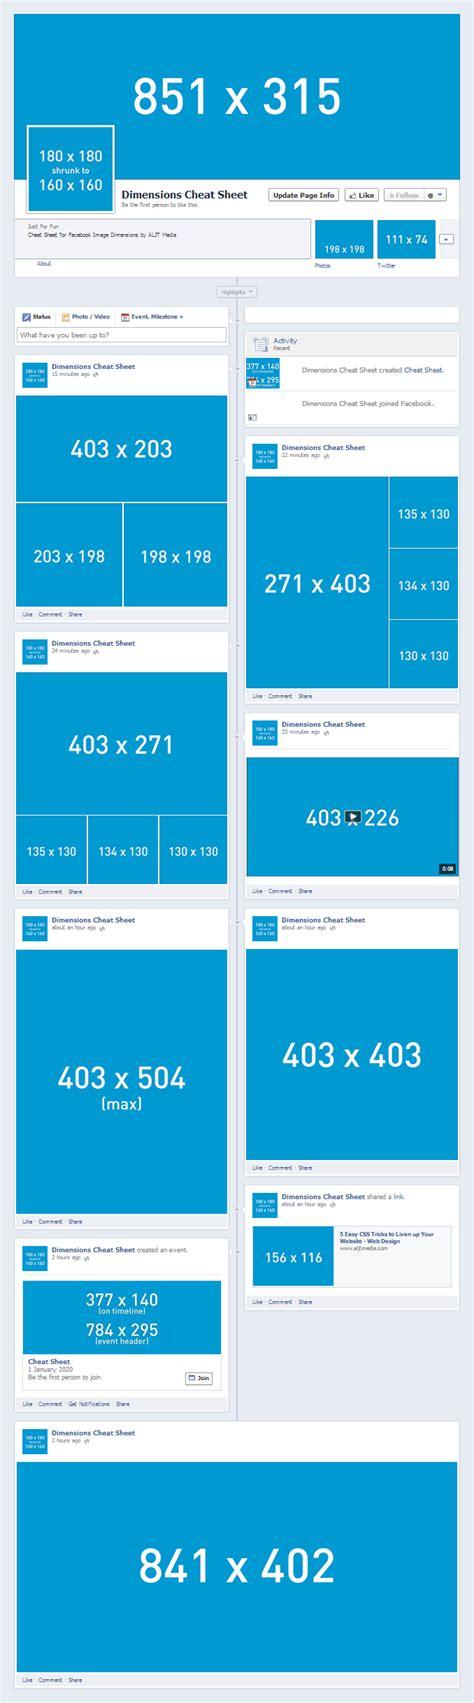 Image Size For Post Social Media Image Dimensions Sheet Design